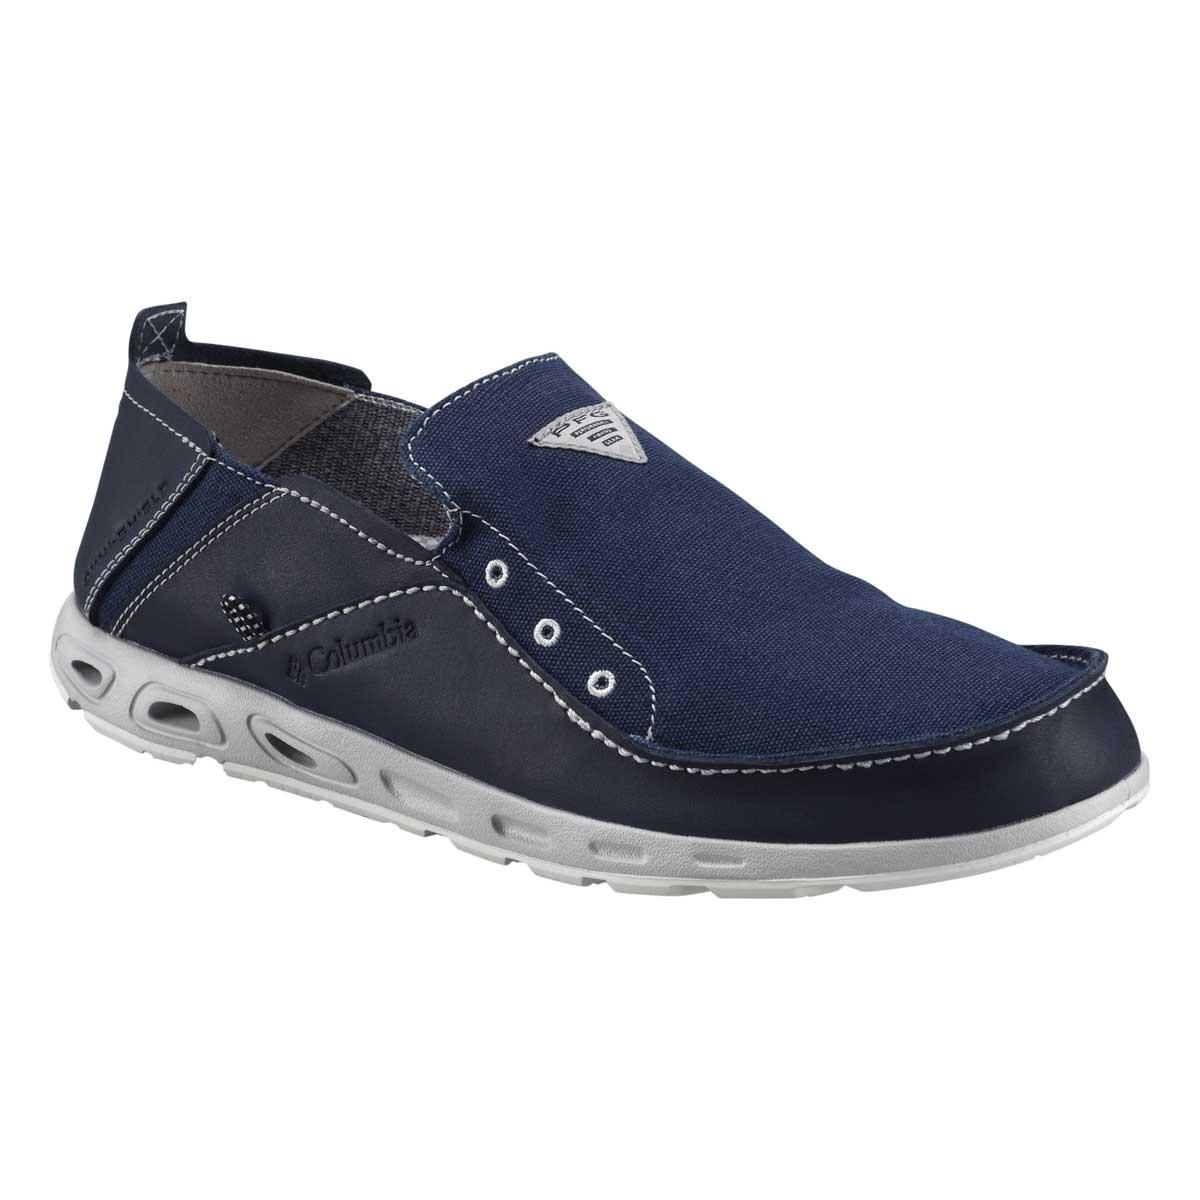 Columbia pfg bahama vent shoe collegiate navy cool for Columbia fishing shoes